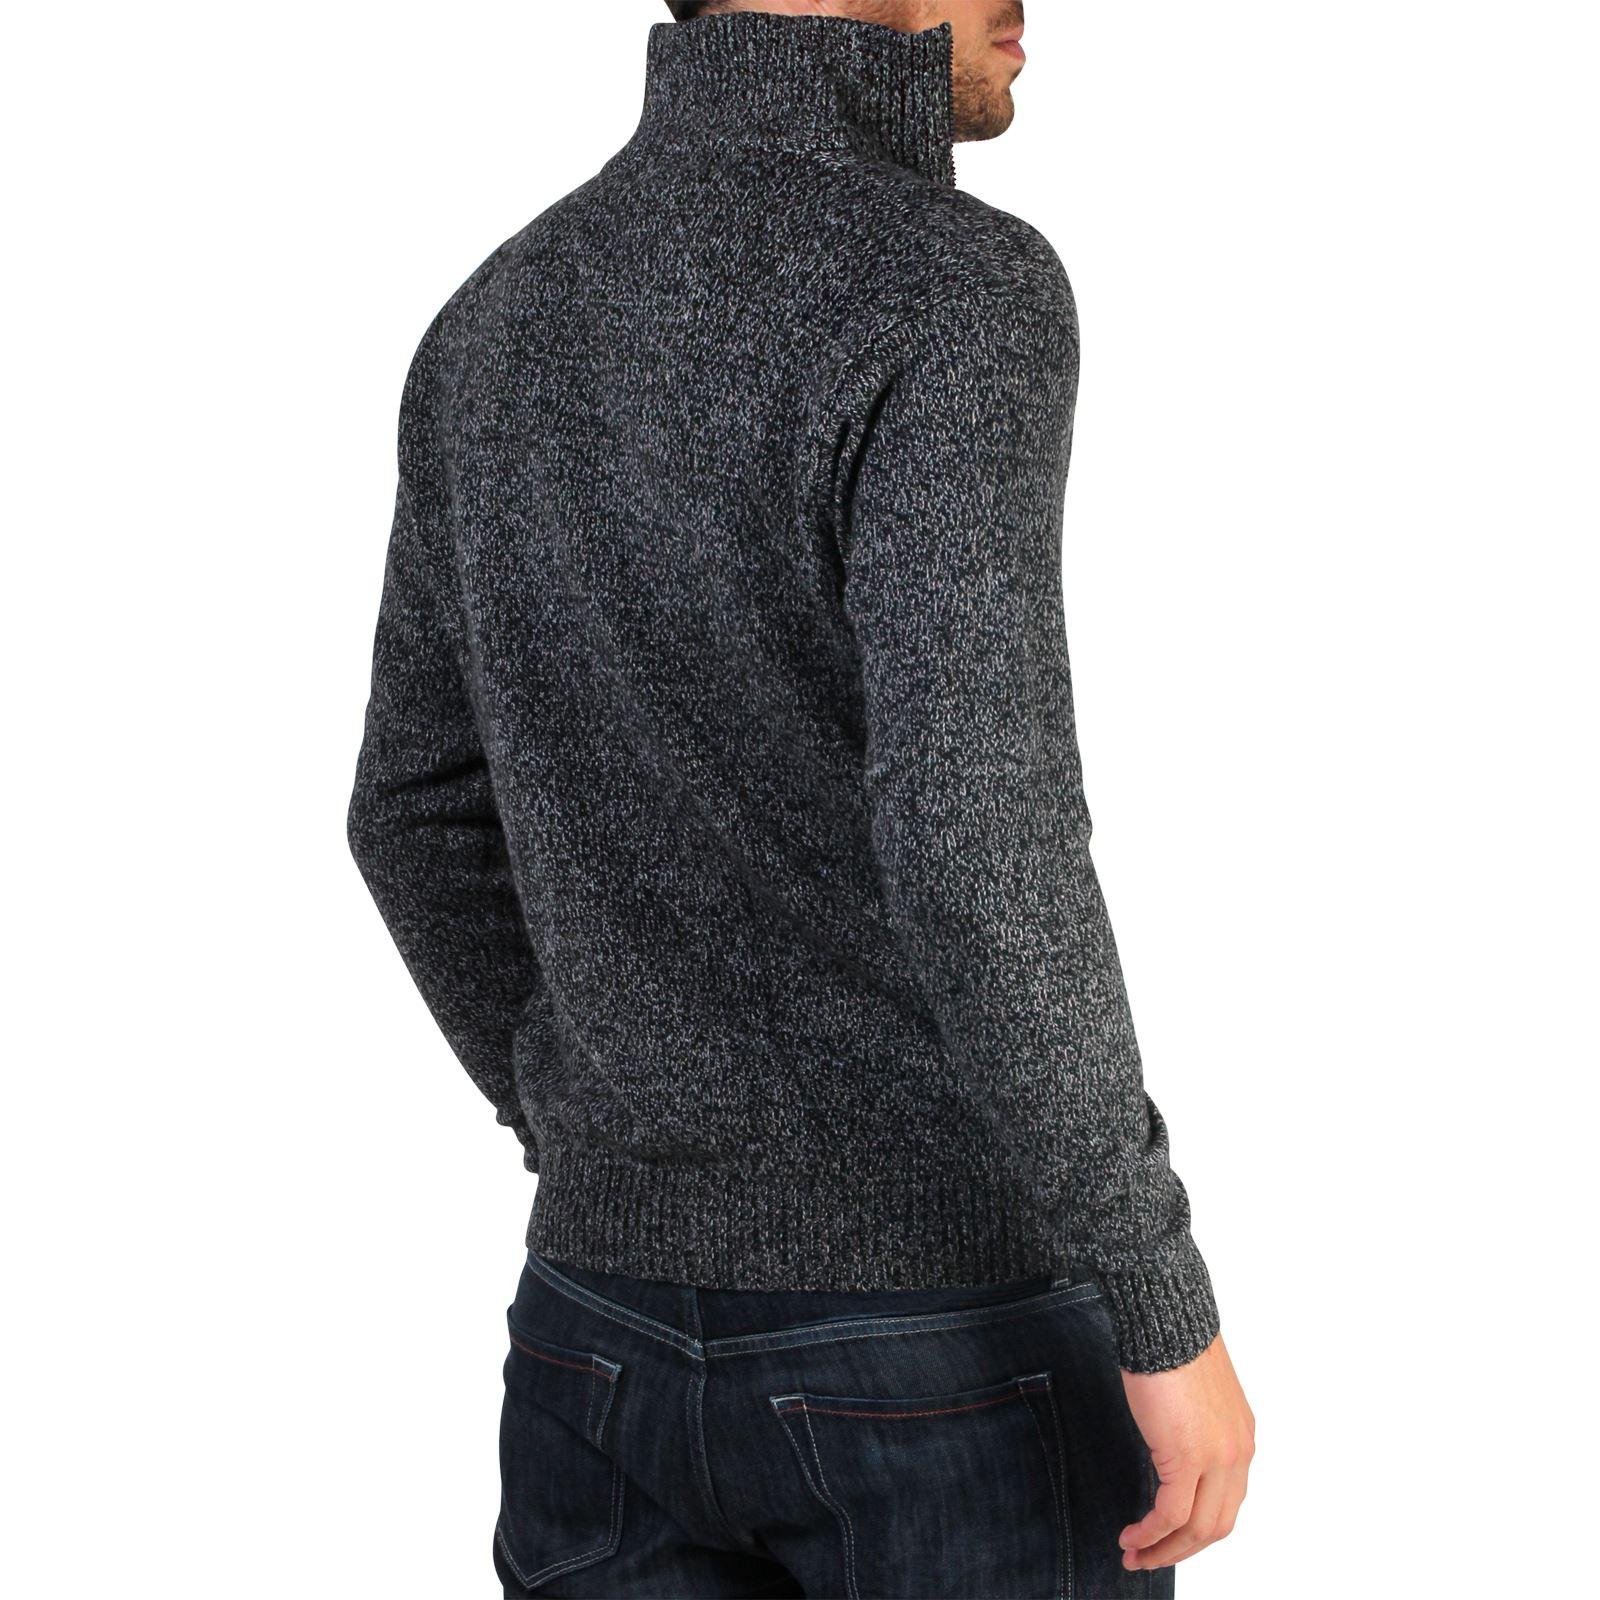 Mens-Wool-Jumper-Winter-Sweater-Zip-Up-Funnel-Neck-Soft-Knit-Cardigan-Top thumbnail 3